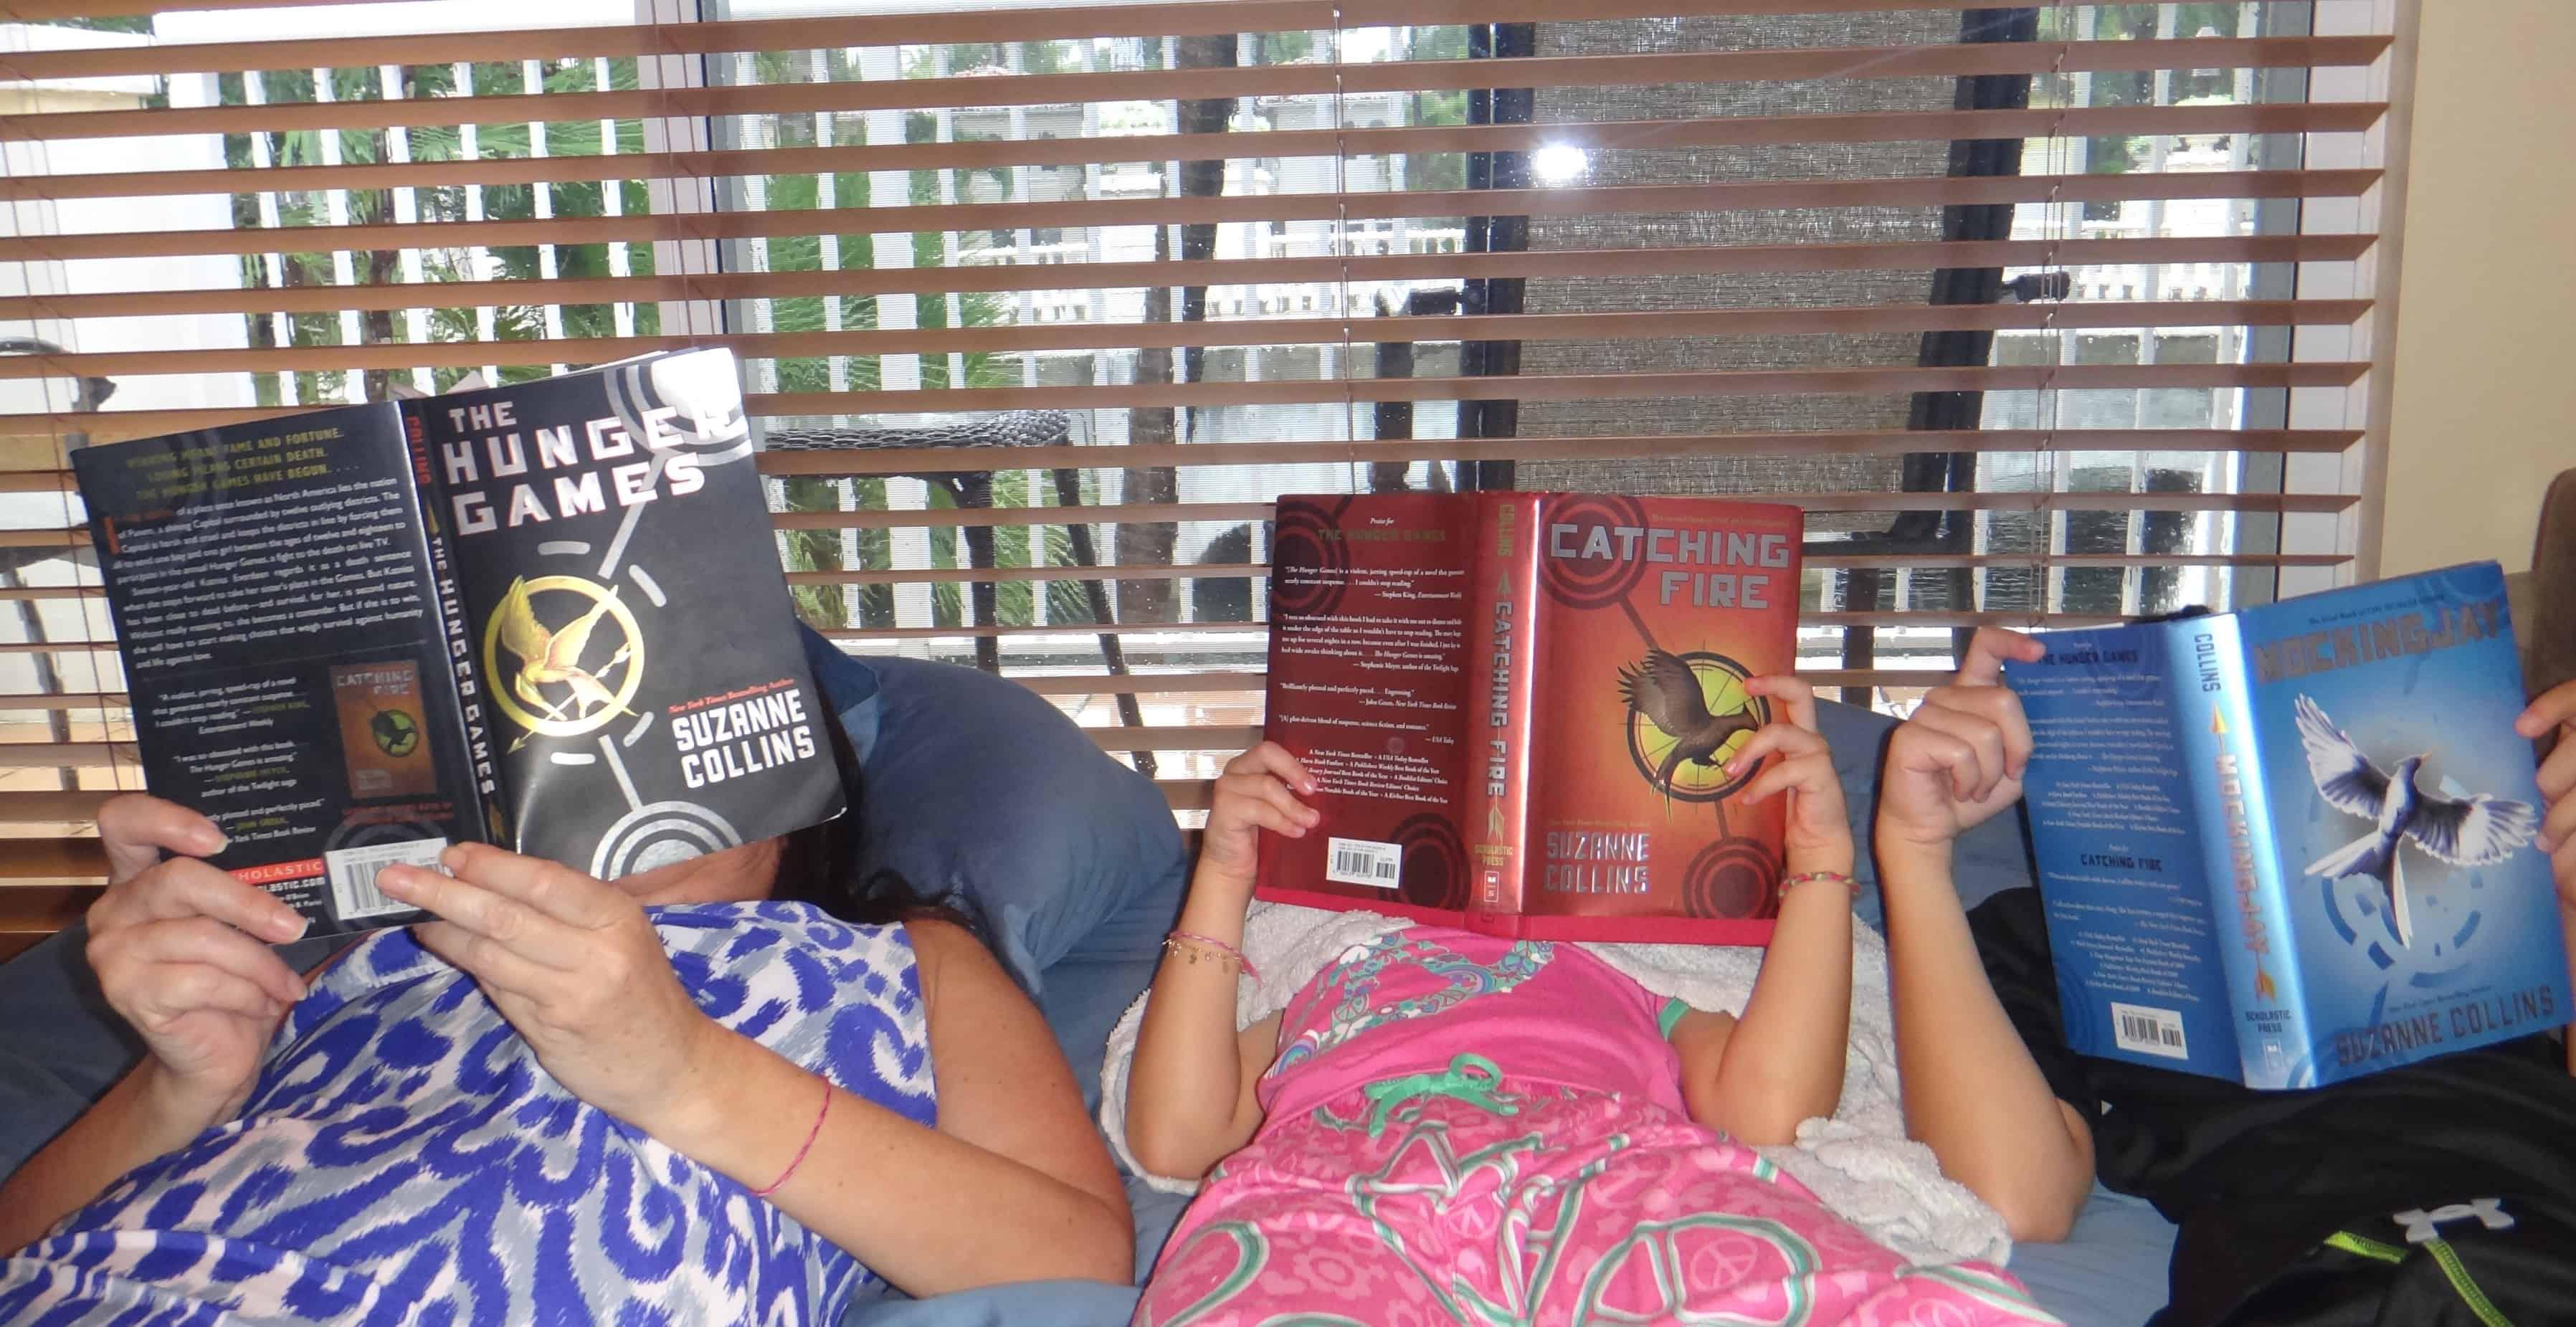 Troligía The Hunger Games